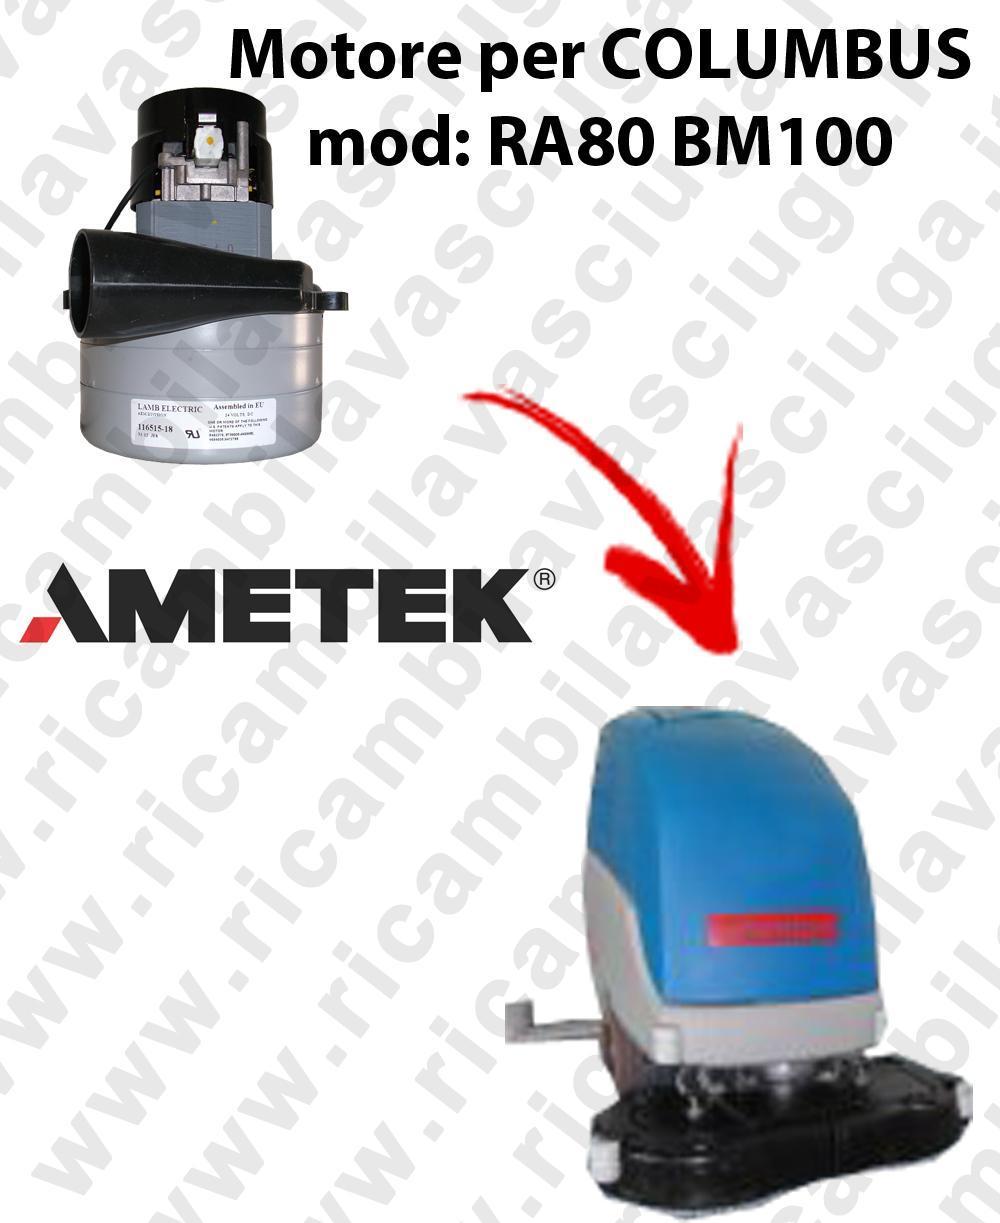 RA80 BM100 Motore de aspiración LAMB AMETEK para fregadora COLUMBUS